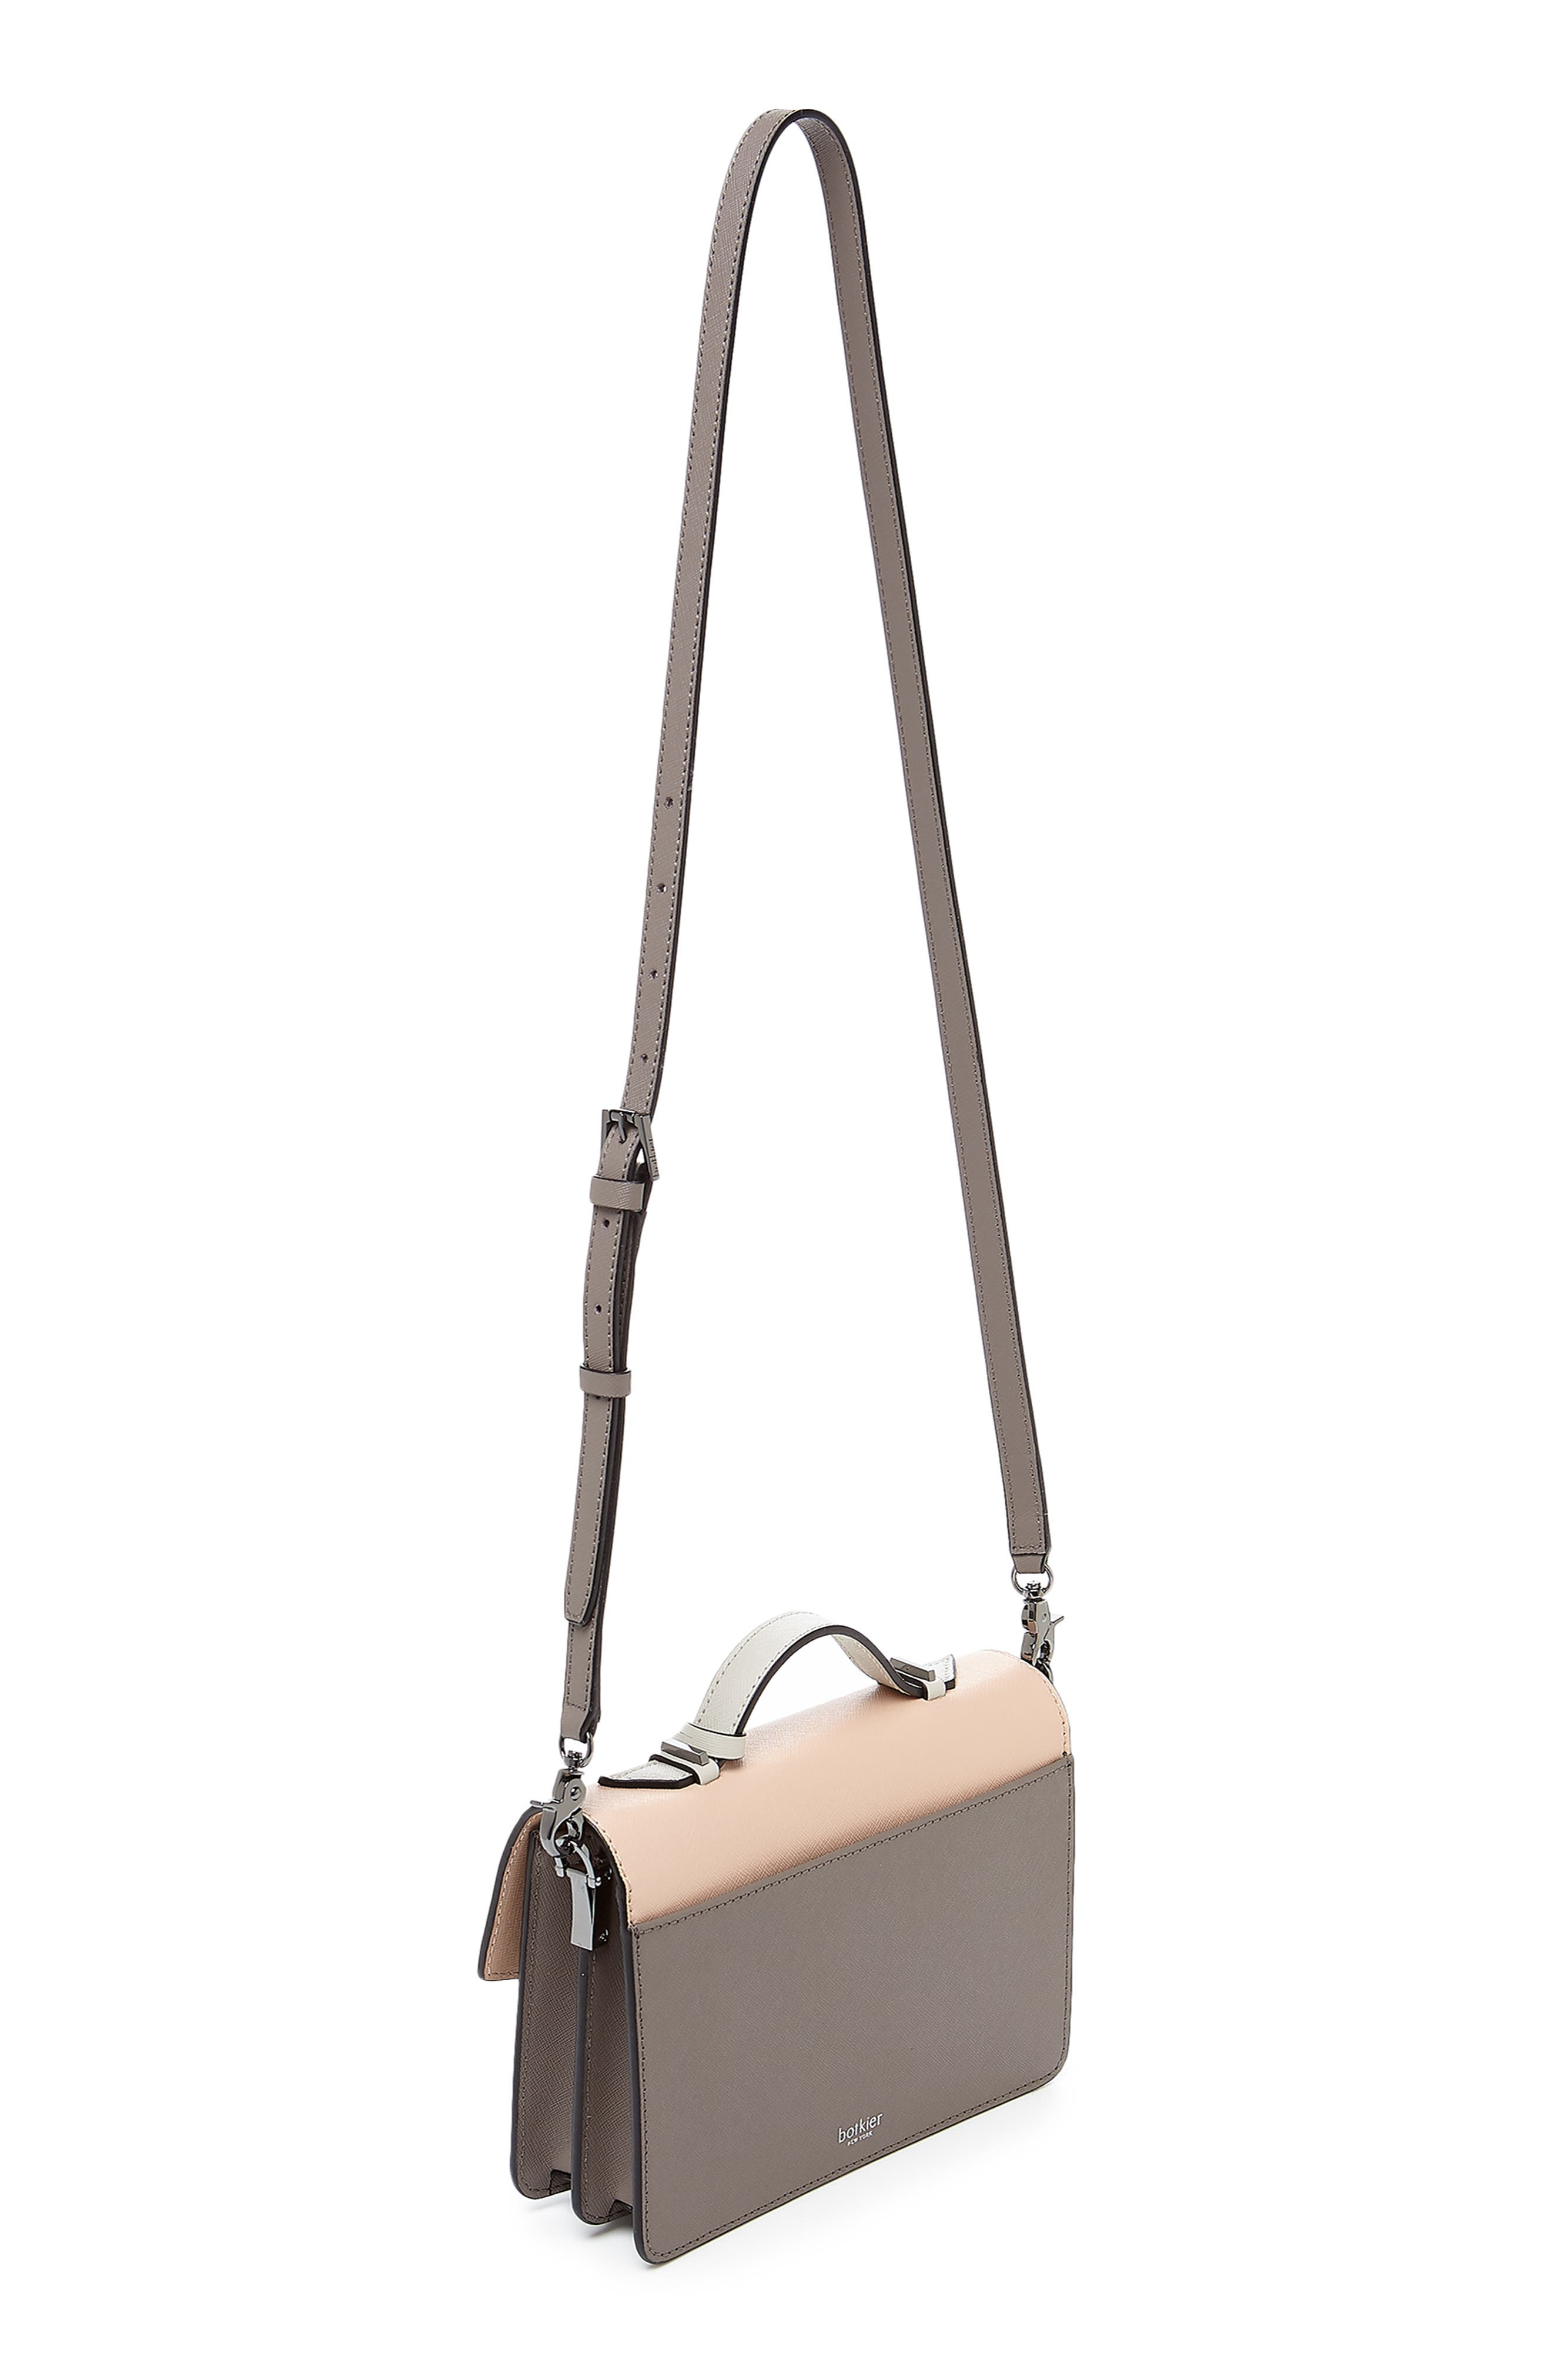 Cobble Hill Calfskin Leather Crossbody Bag,                             Alternate thumbnail 2, color,                             NUDE COMBO